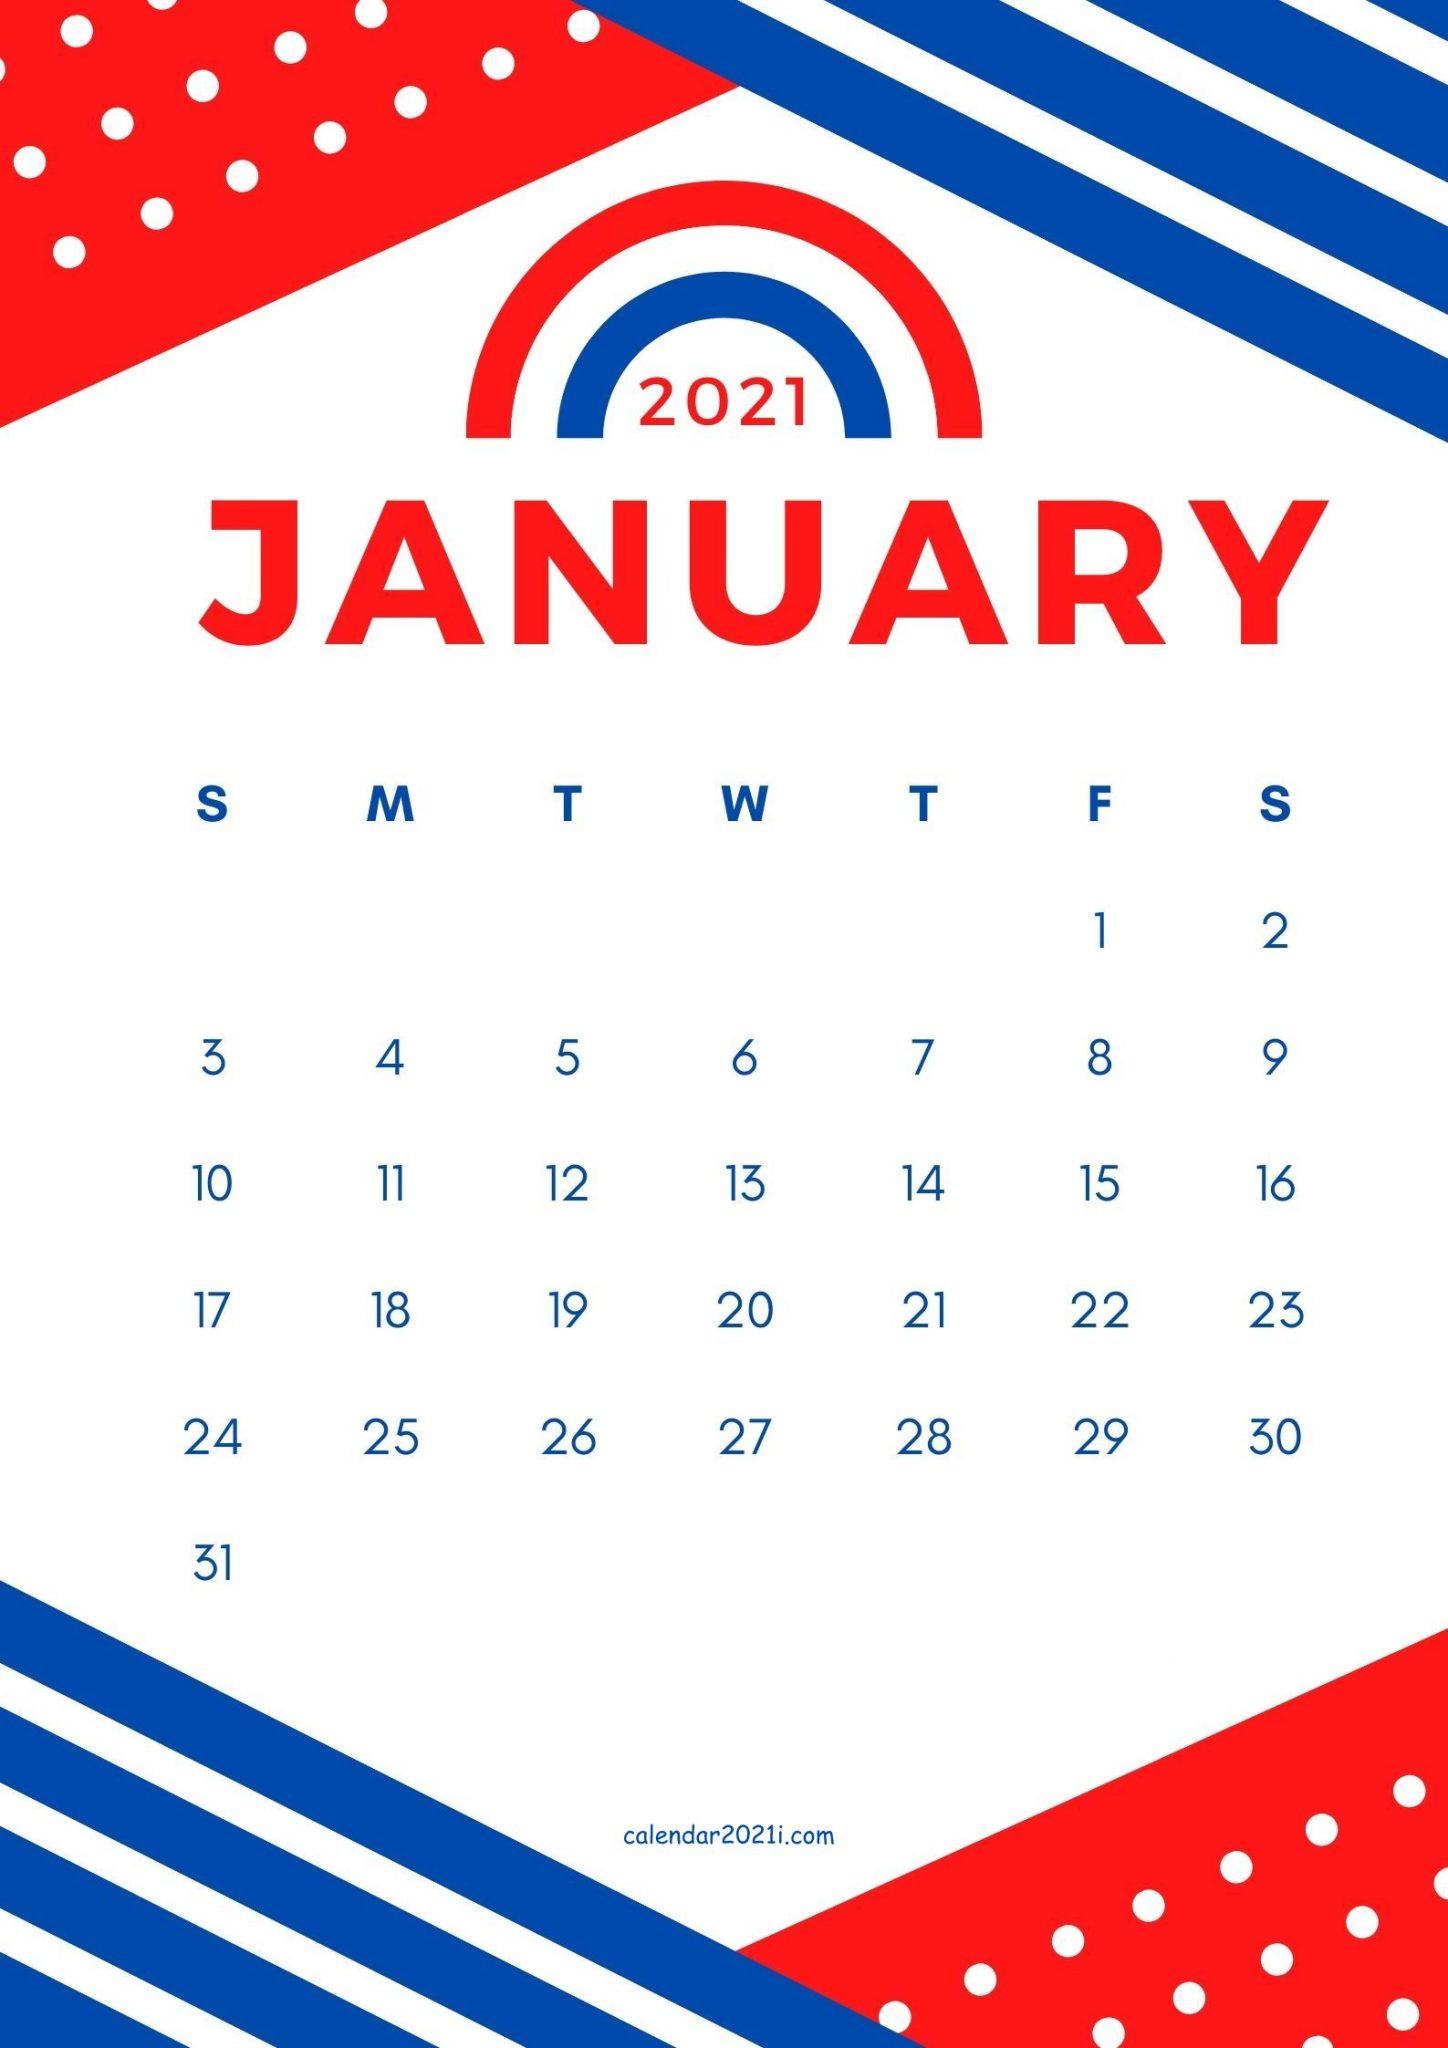 Cute January 2021 Calendar Design